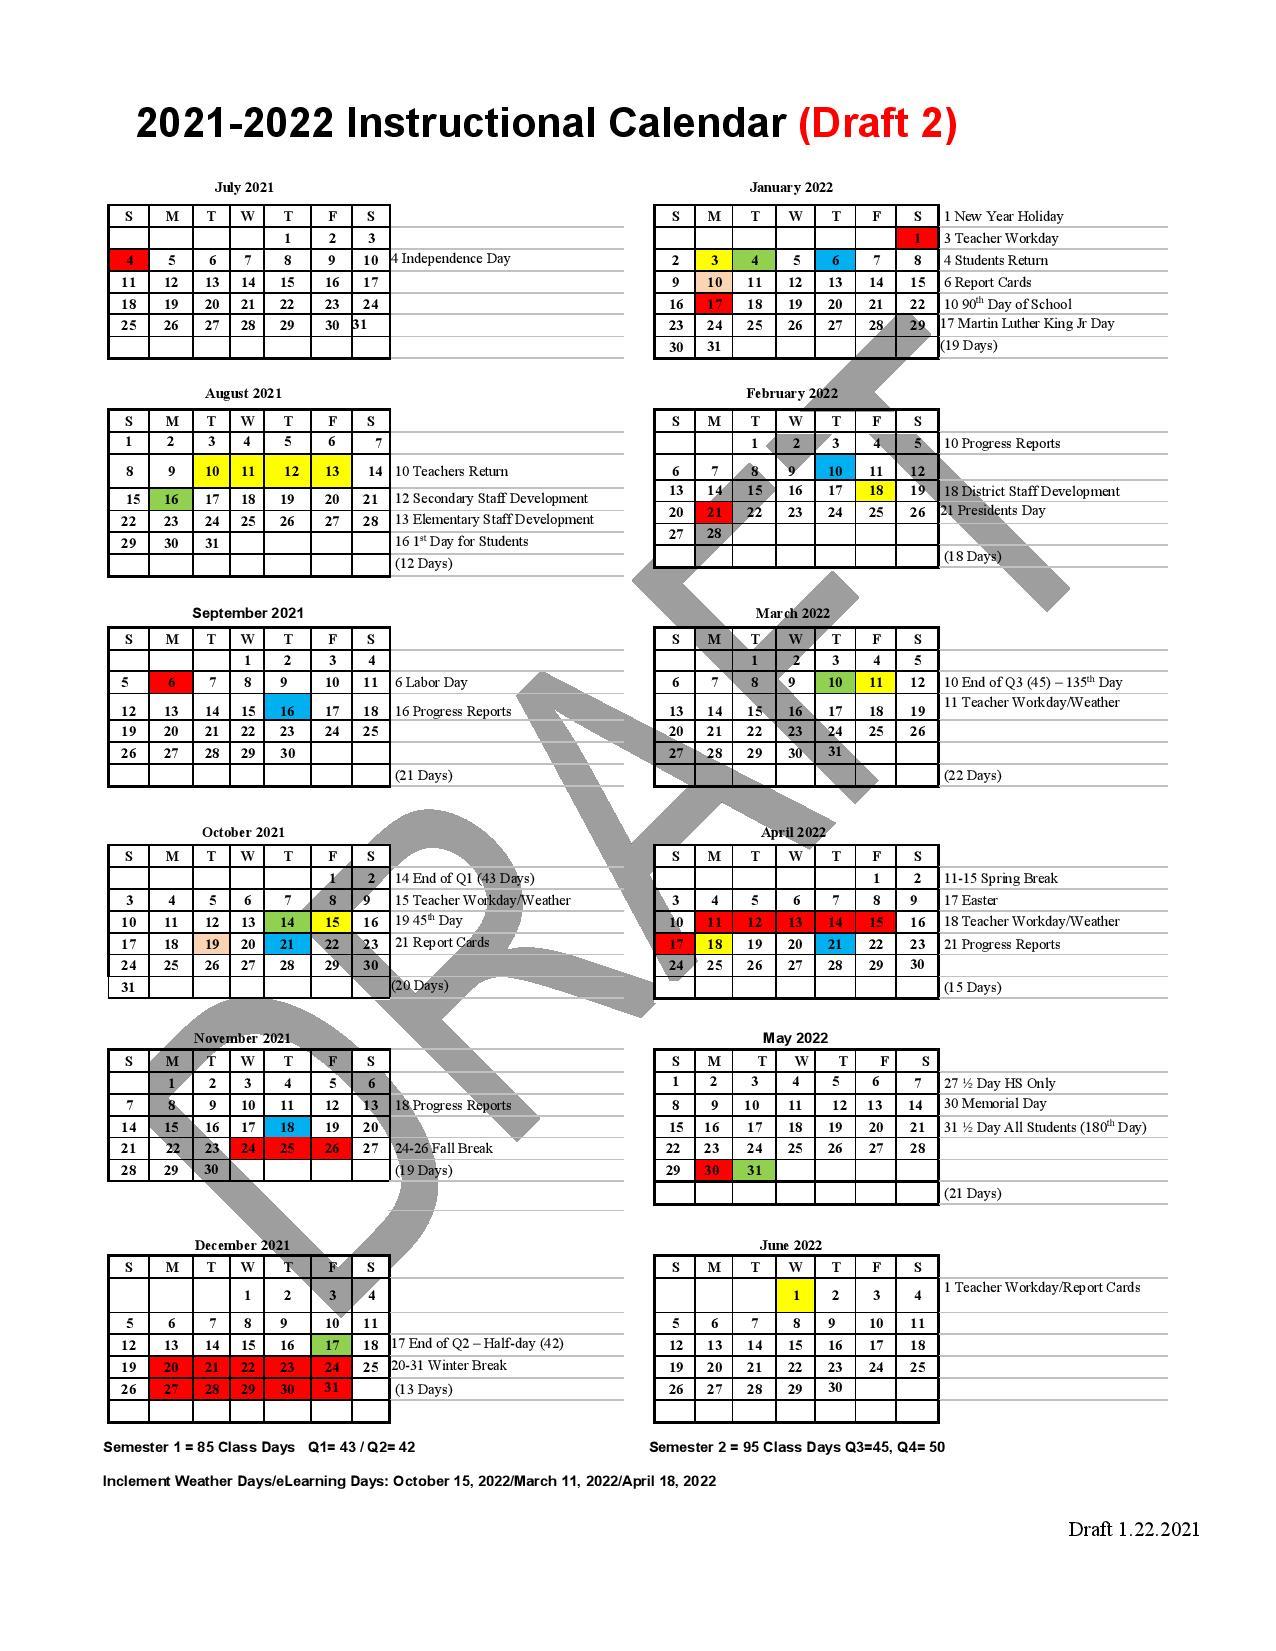 Berkeley 2022 Academic Calendar.Bcsd Considers 2021 22 And 2022 23 Academic Calendars Virtual Option Wcbd News 2